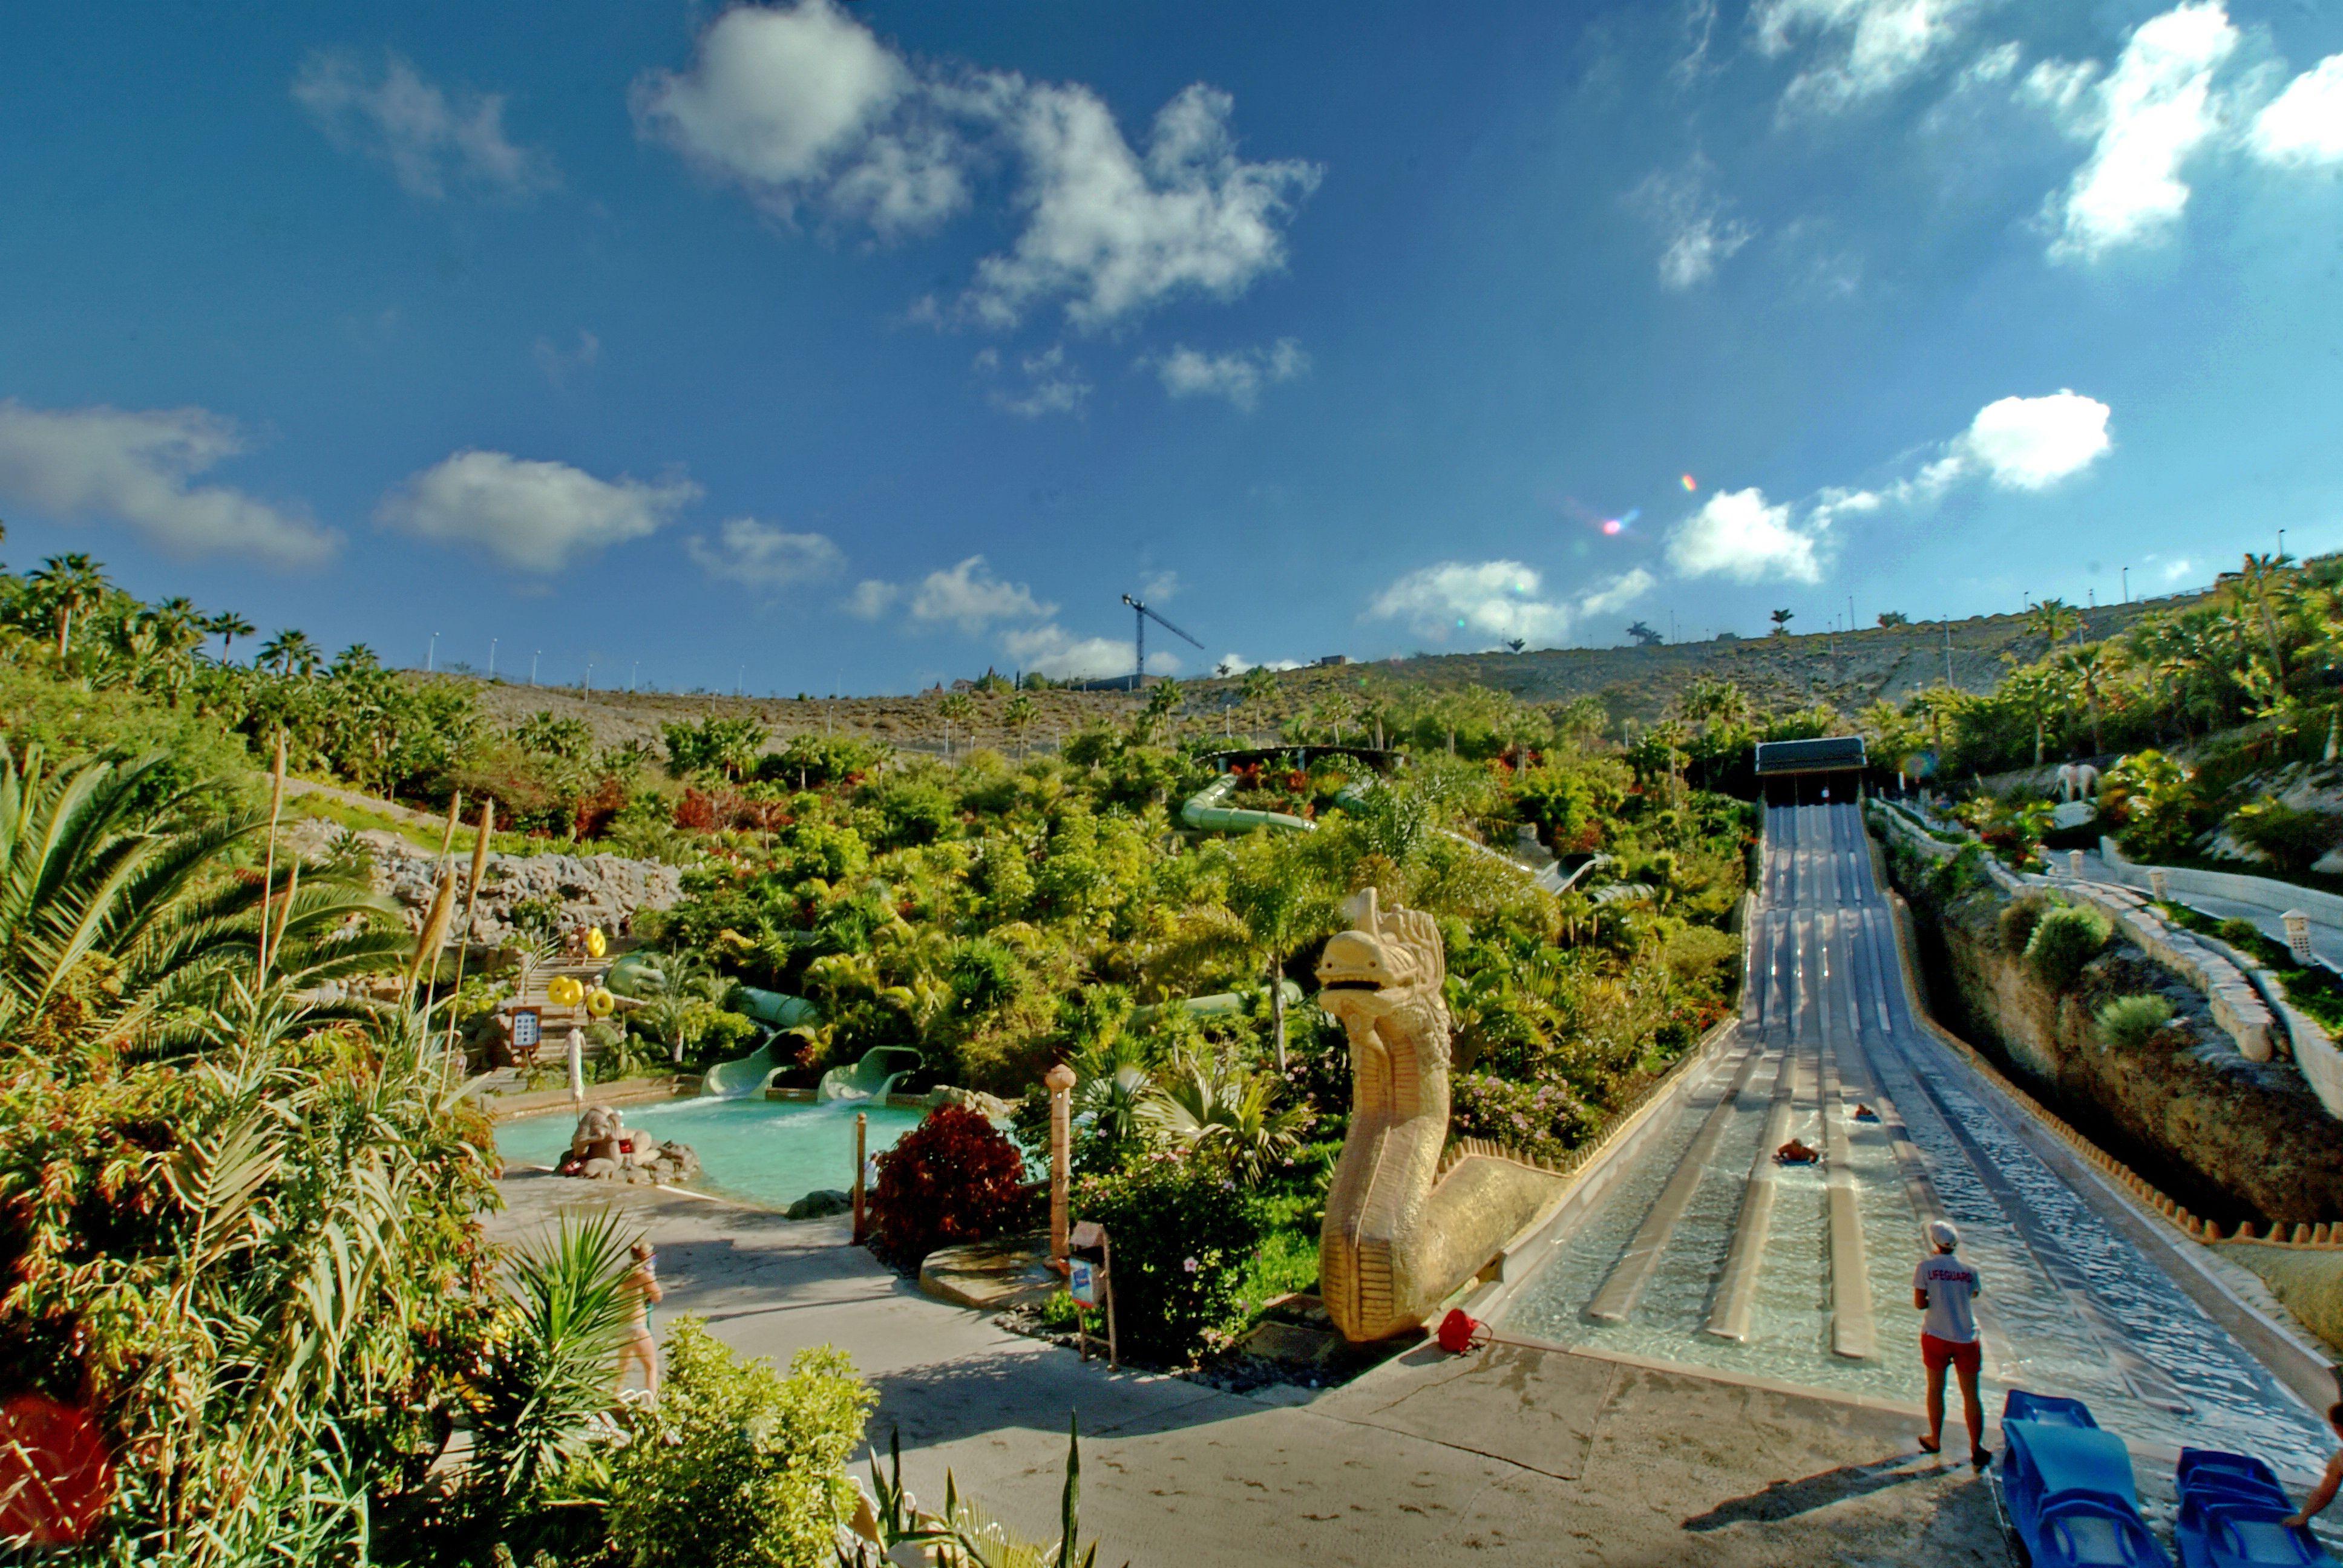 аквапарк сиам парк тенерифе siam park tenerife тенерифе